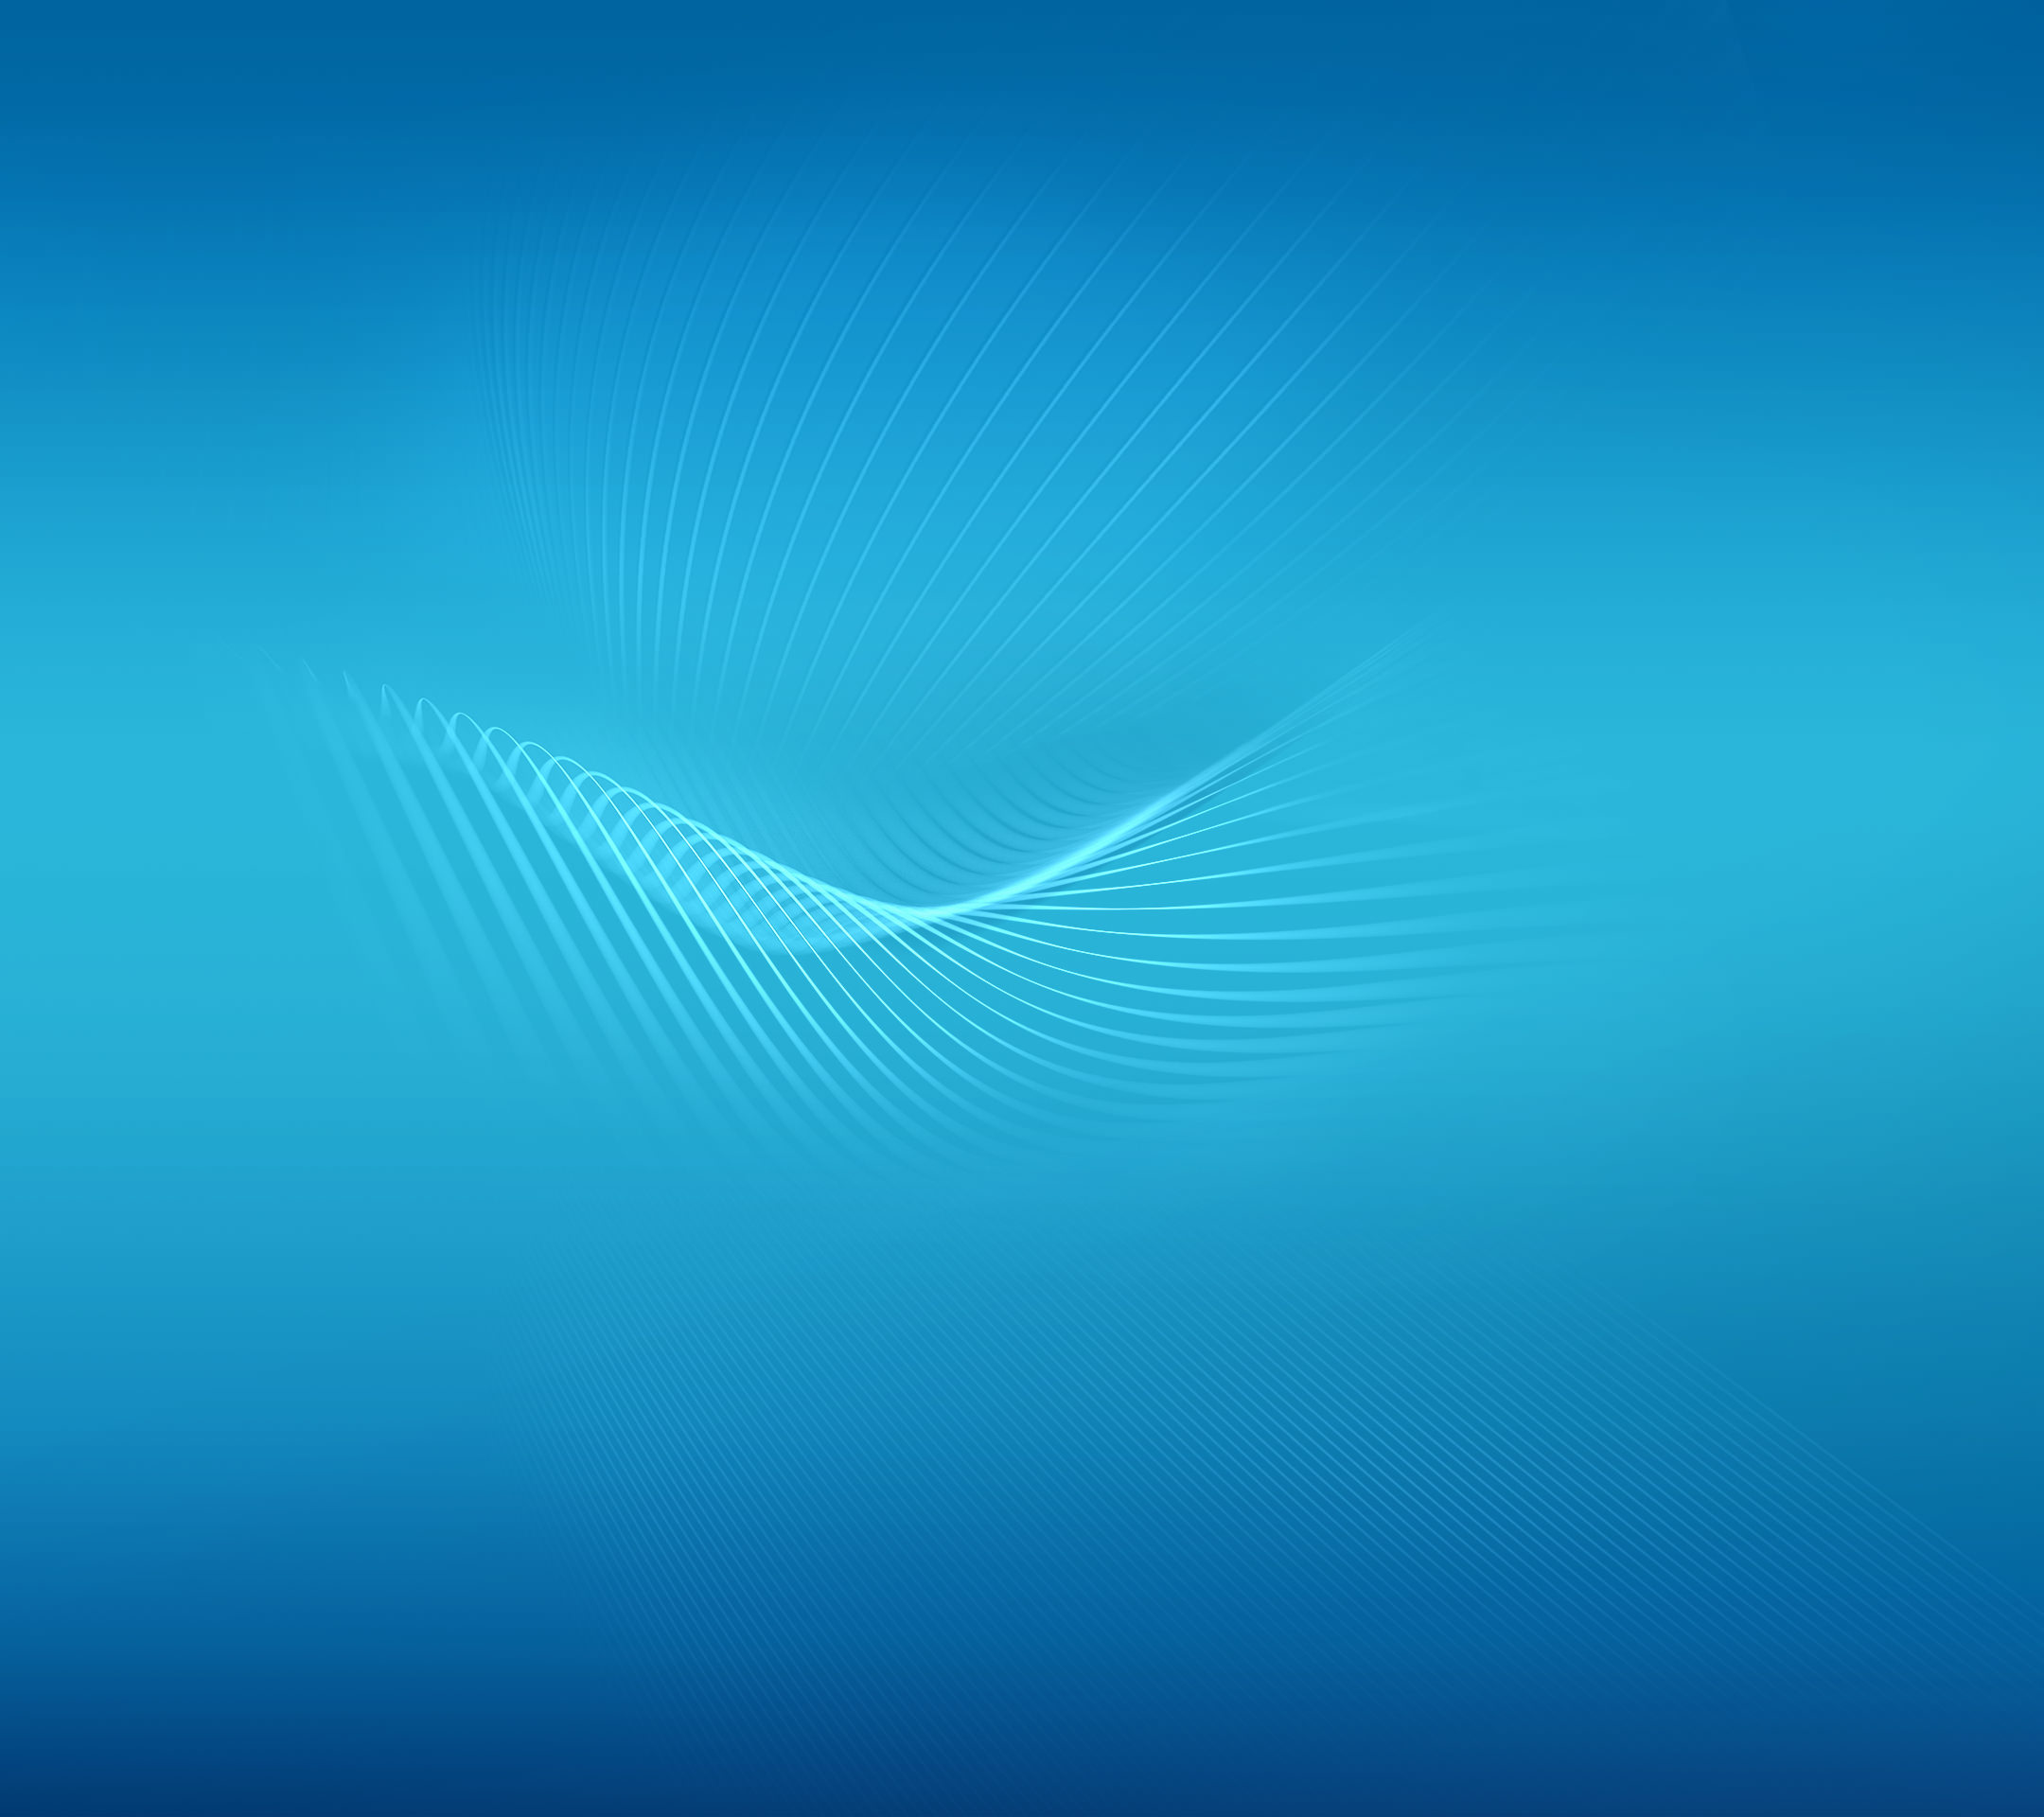 Huawei P9 Stock Wallpaper